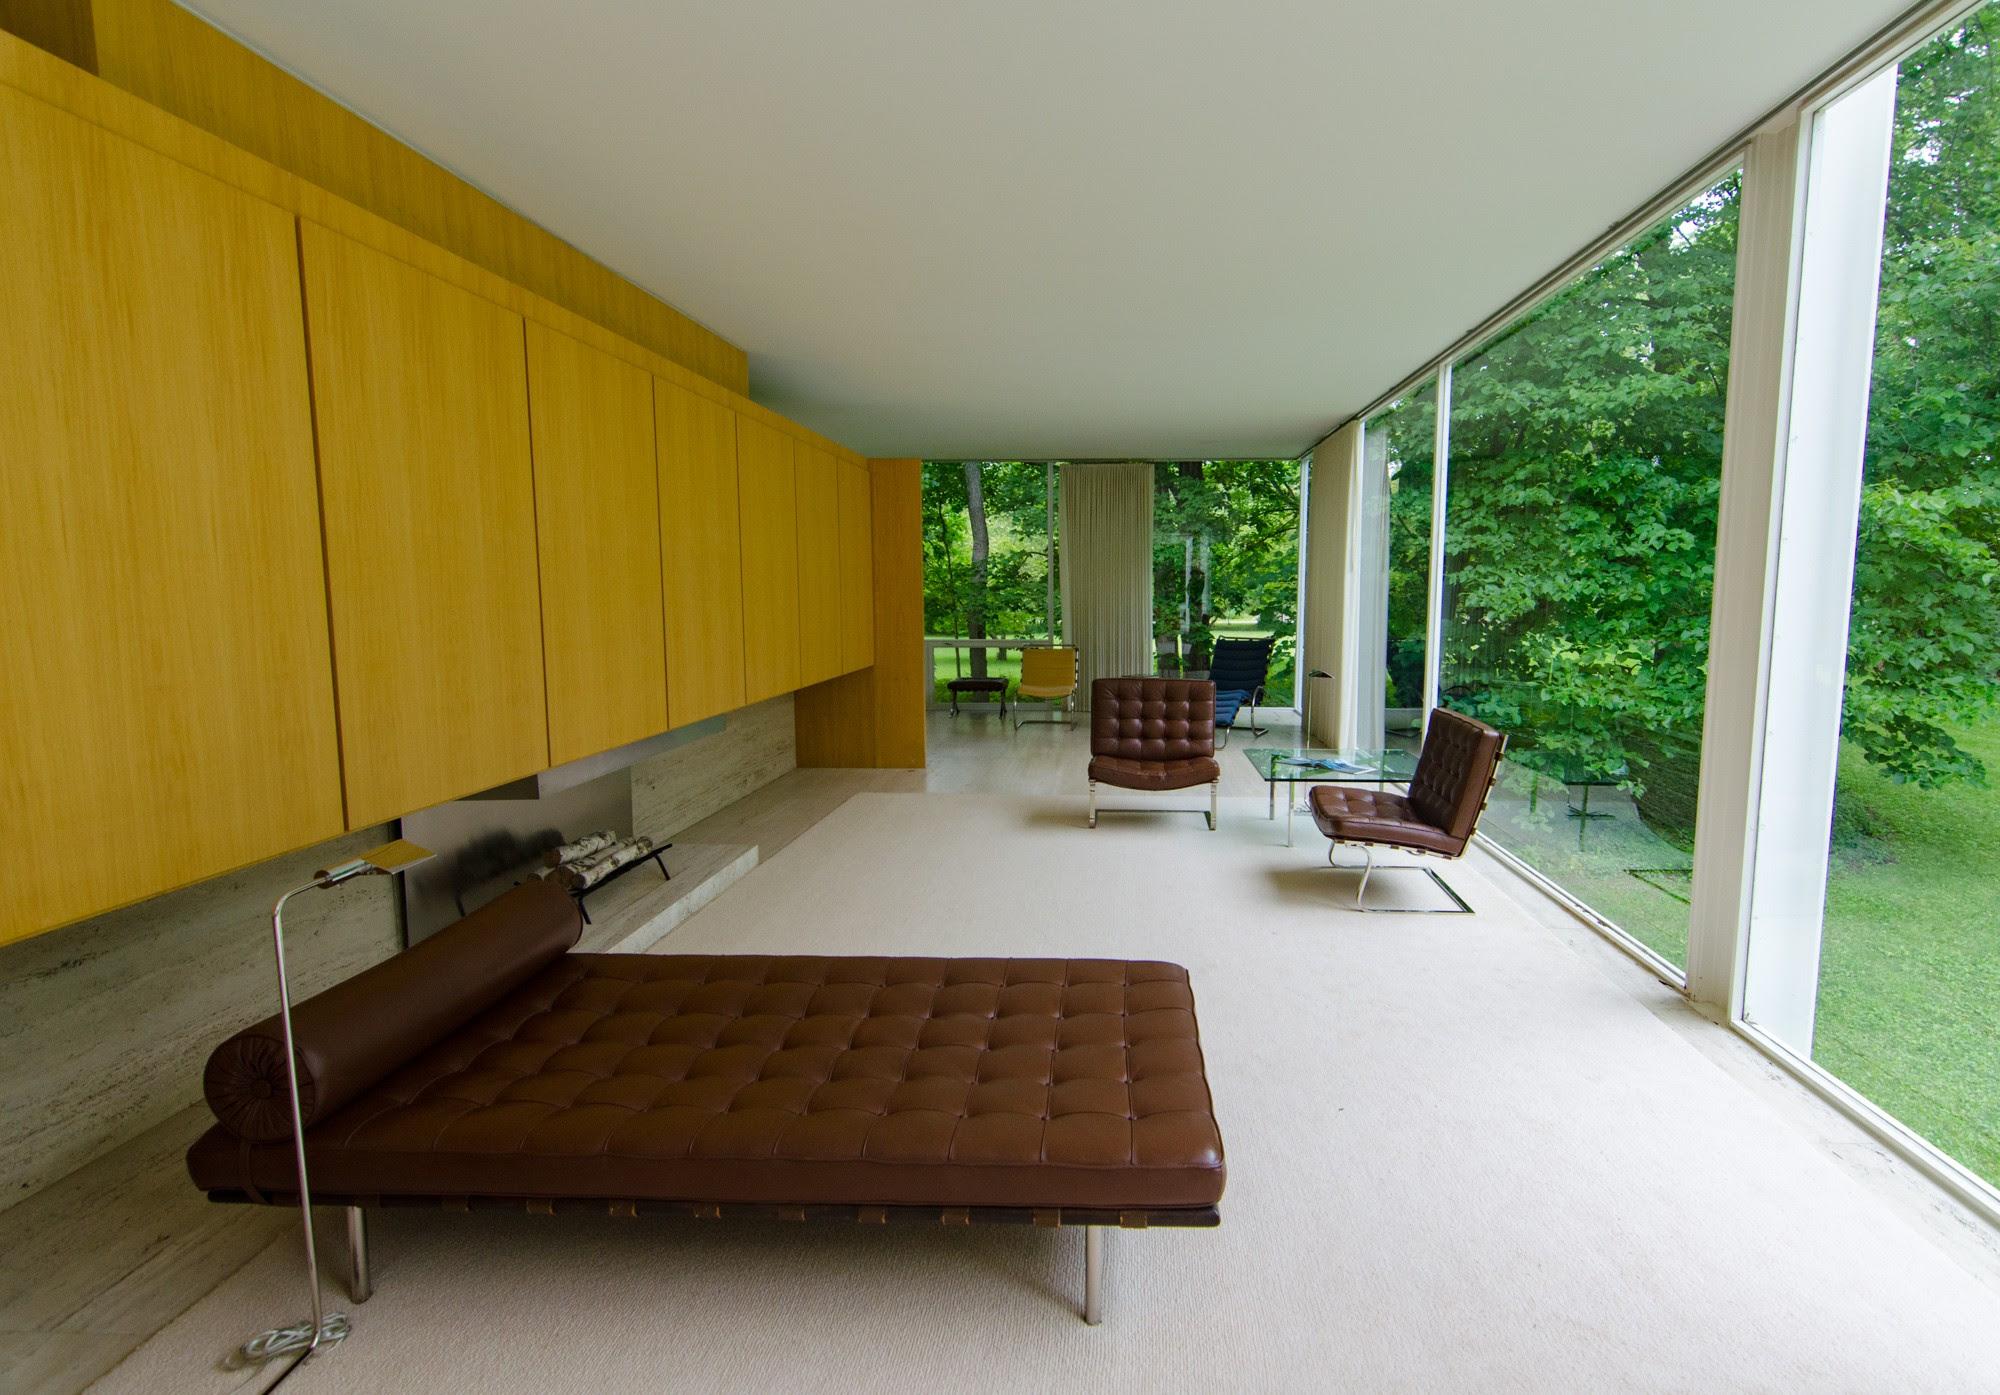 farnsworth house eric allix rogers 02